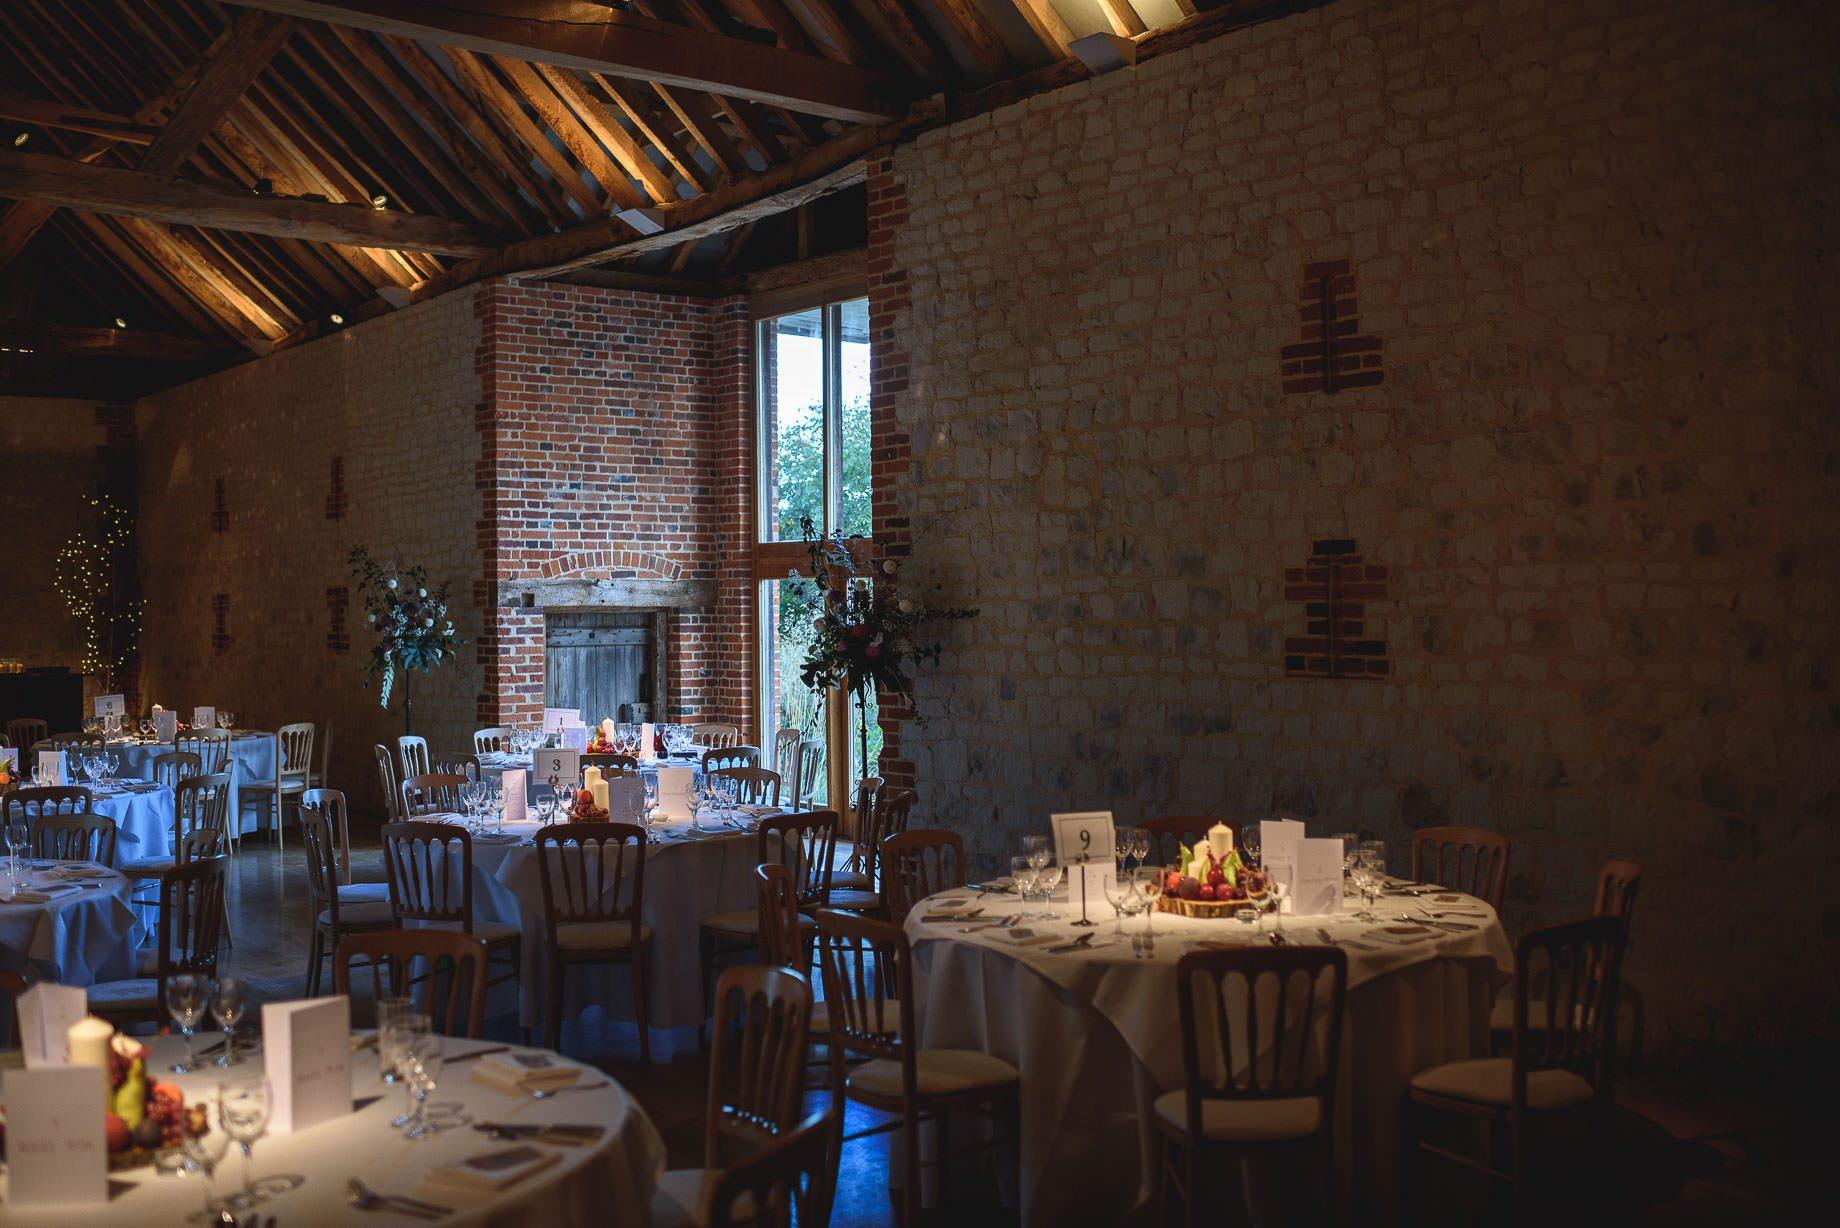 bury-court-barn-wedding-photography-guy-collier-photography-nadia-tom-112-of-184